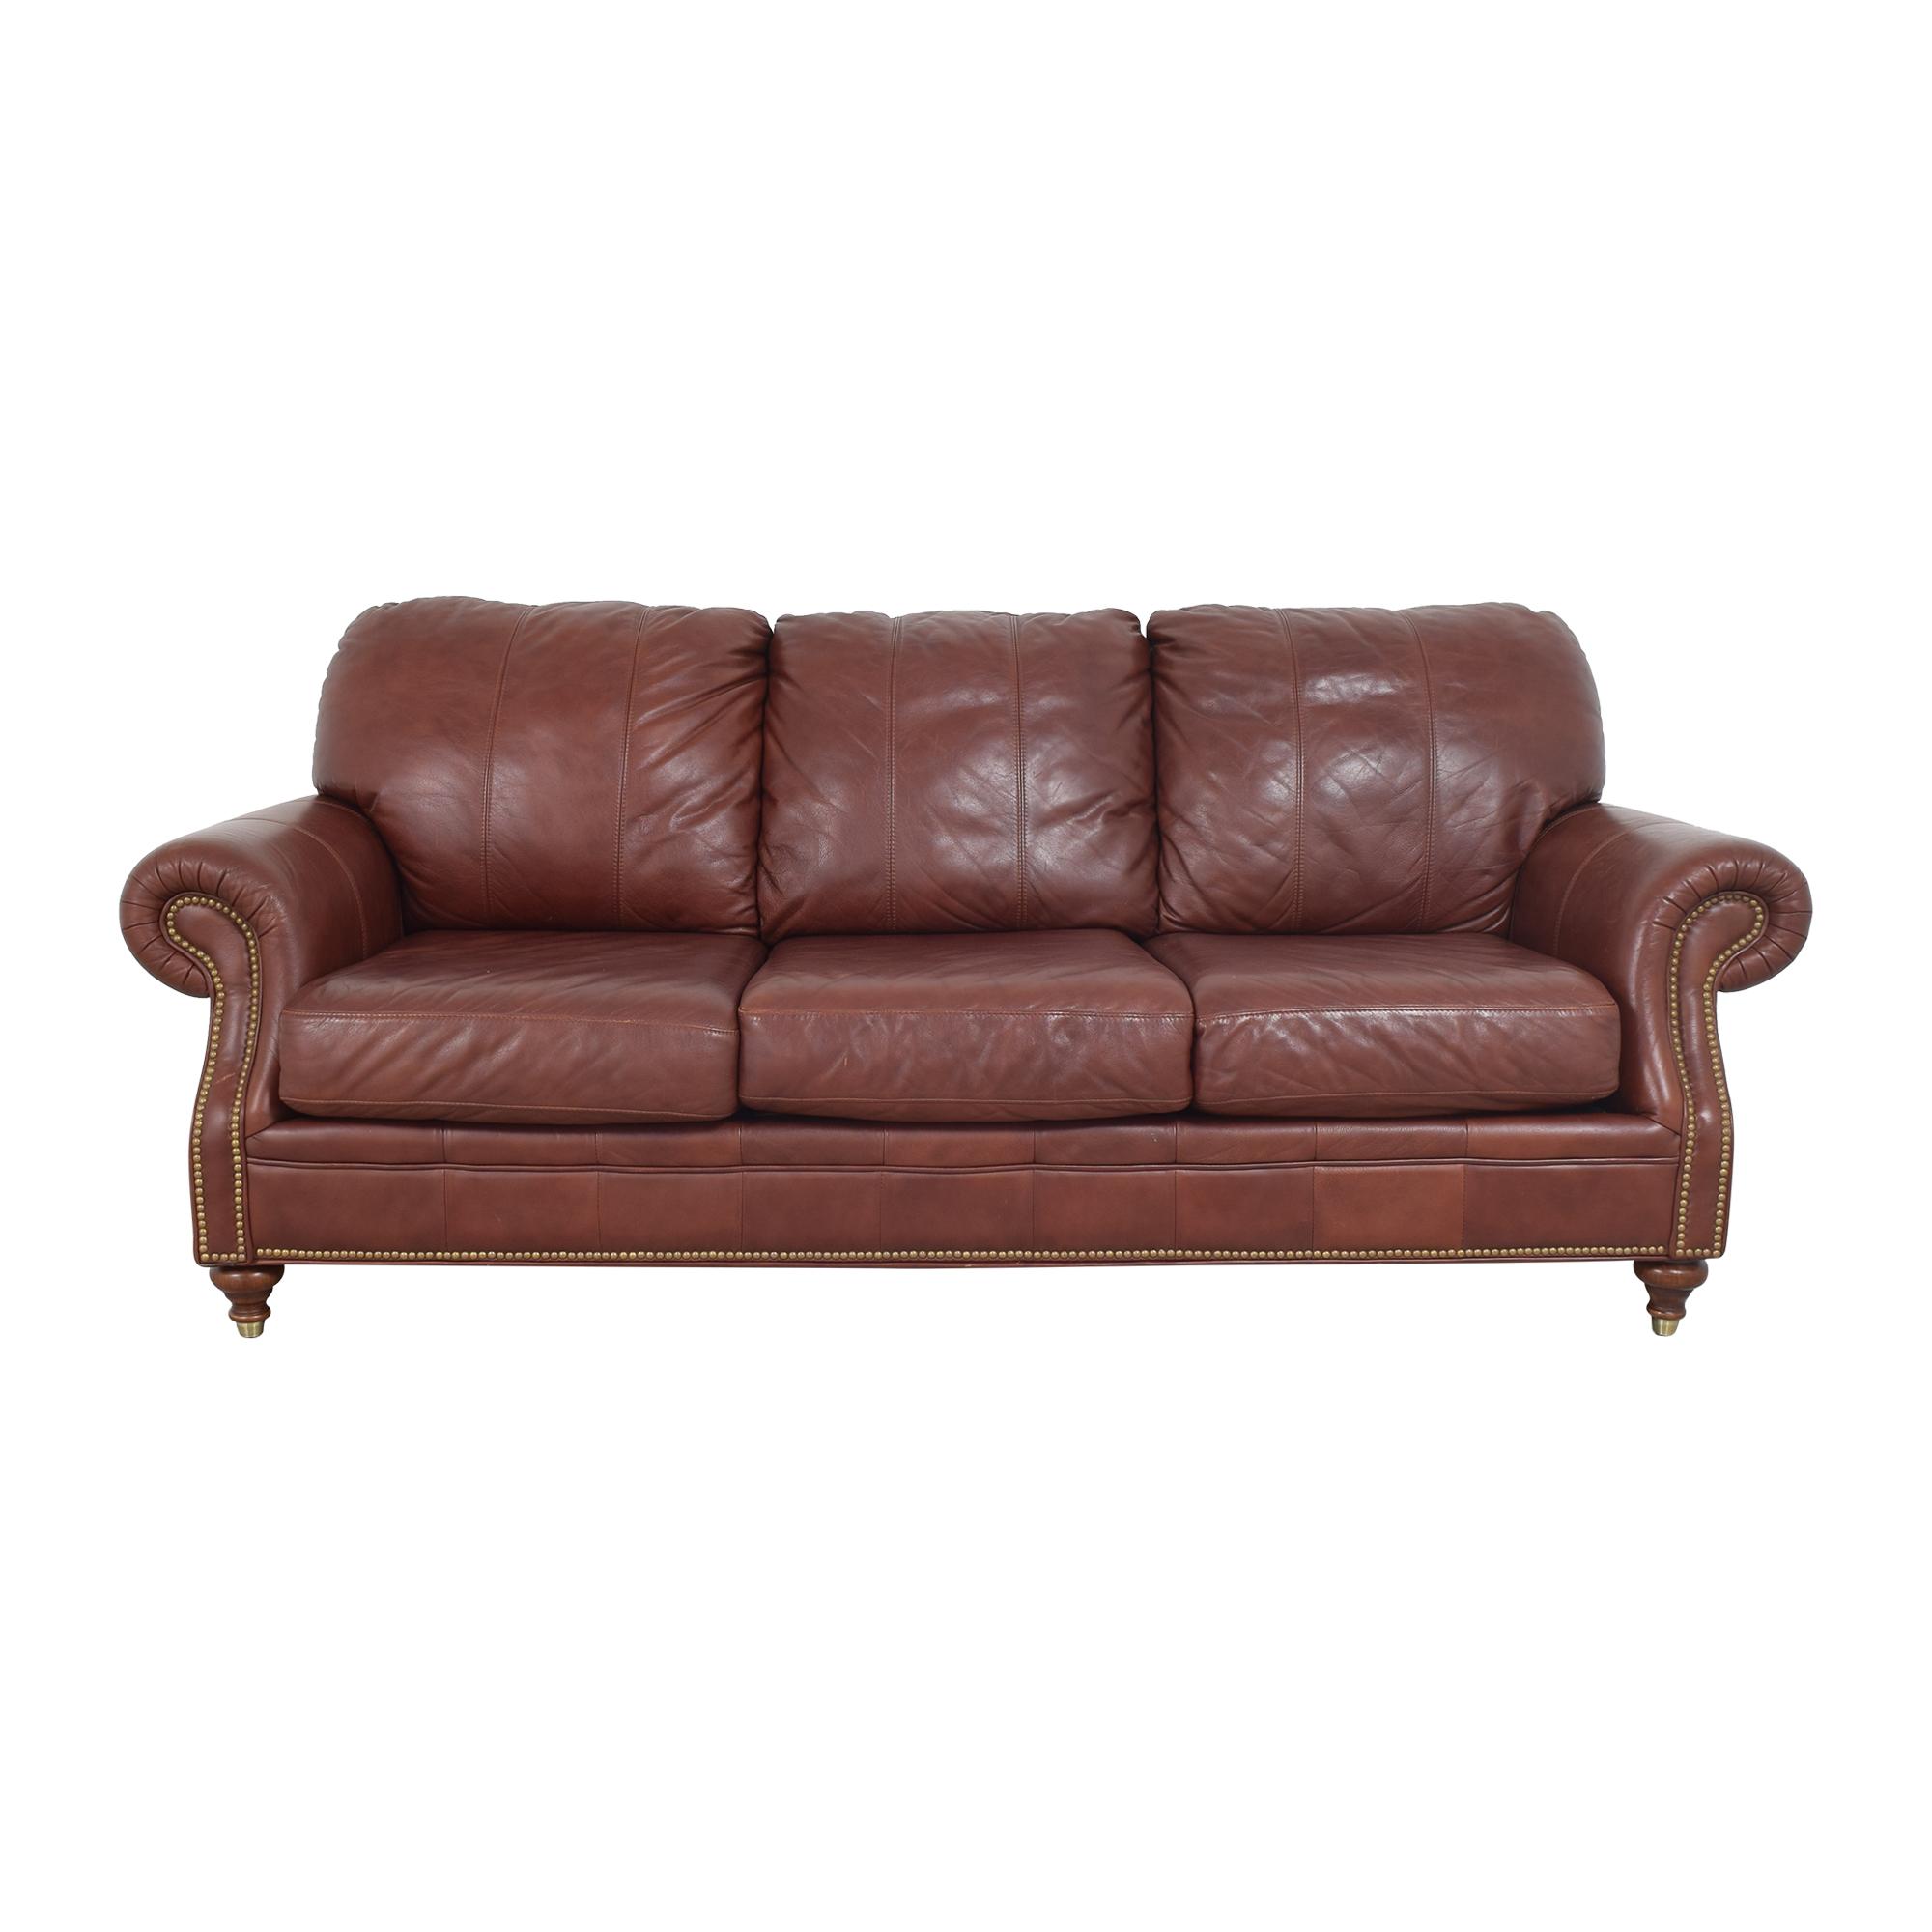 Ethan Allen Ethan Allen Roll Arm Nailhead Sofa Sofas